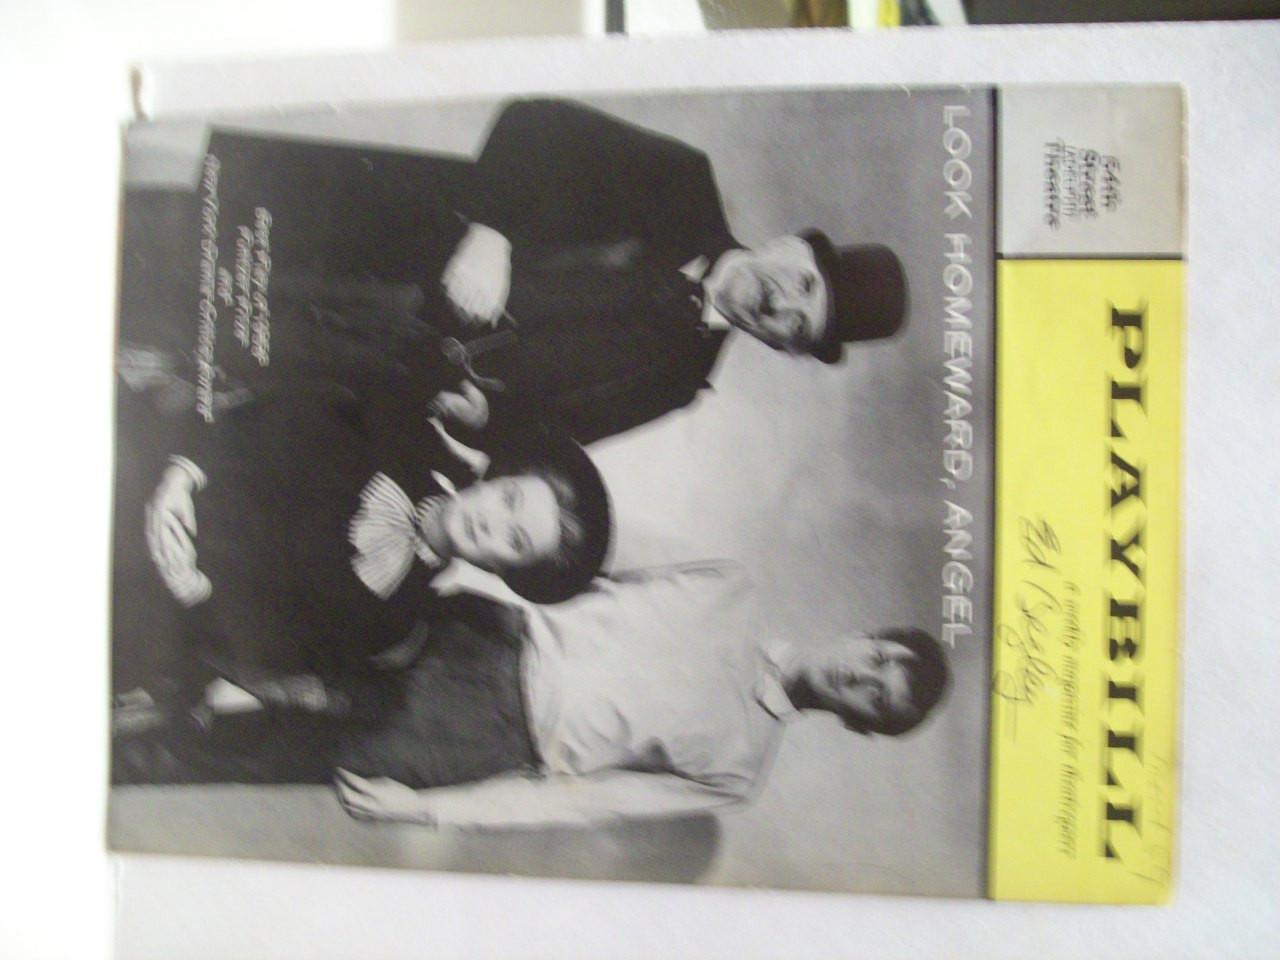 Begley, Ed Playbill Signed Autograph Look Homeward Angel With Original Ticket Stub 1959